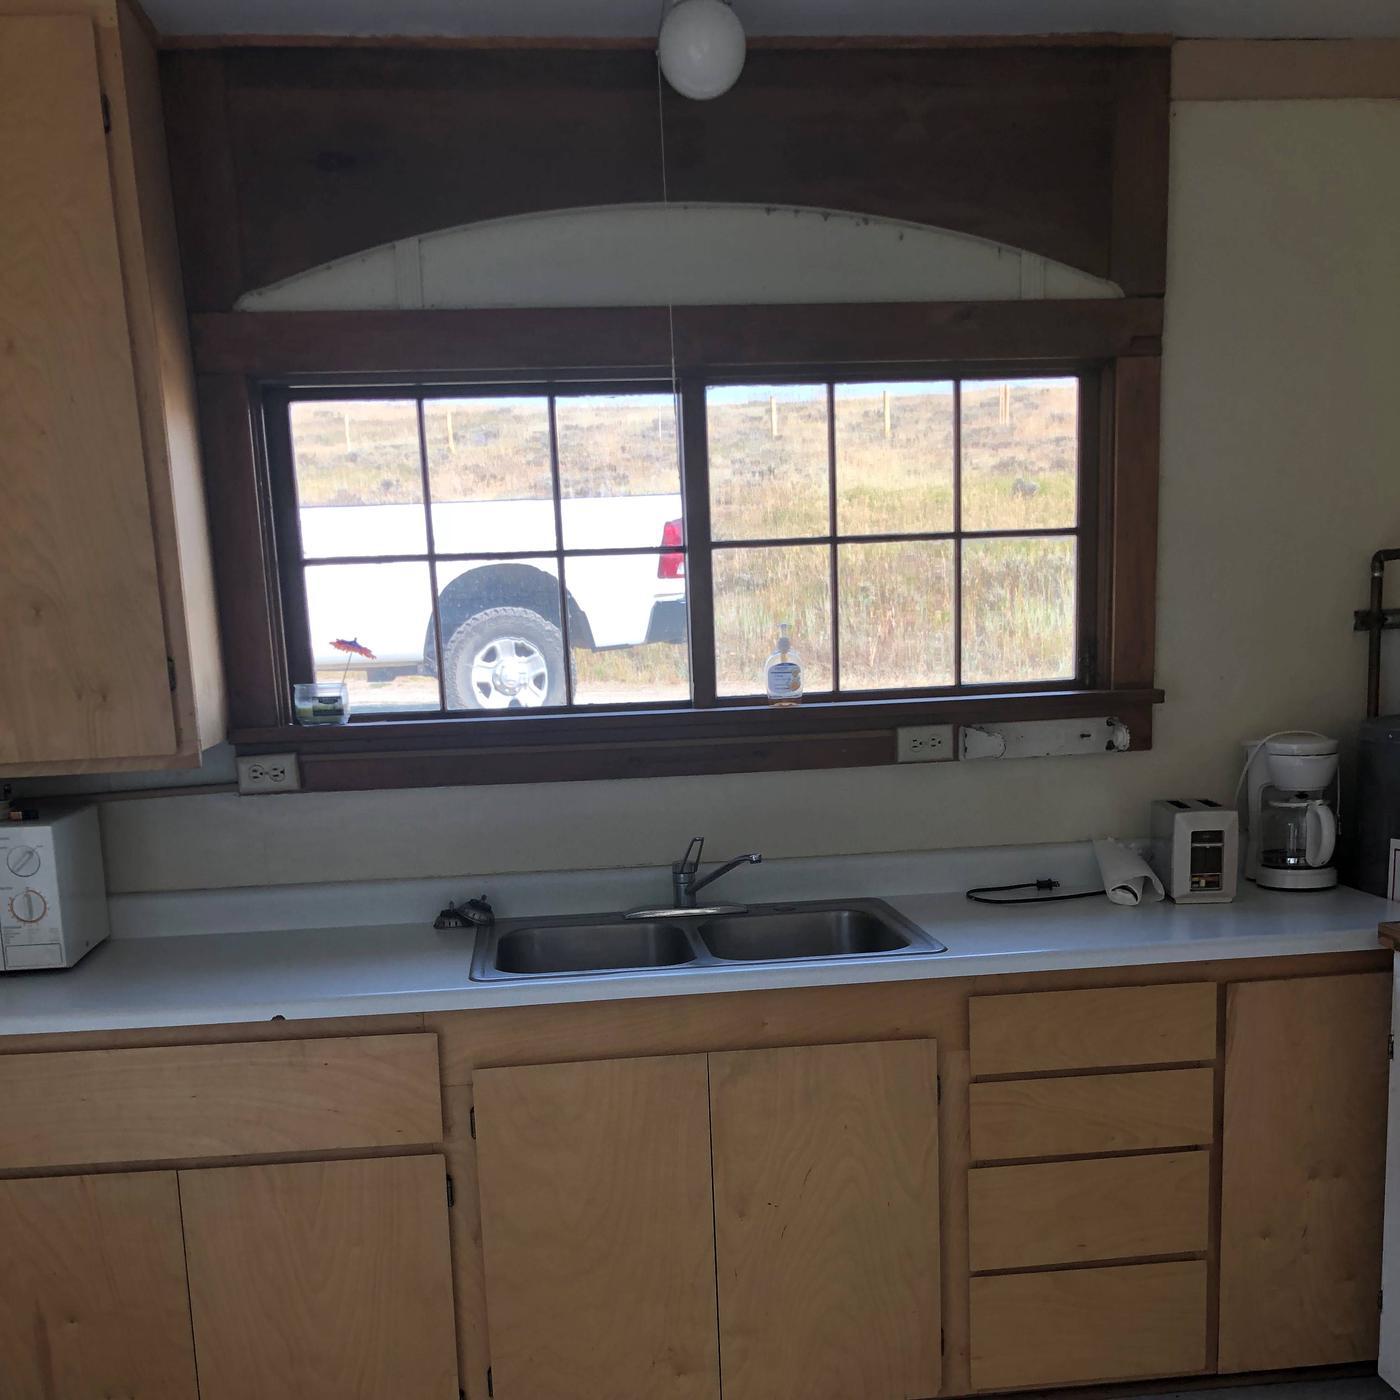 Kitchen WindowKitchen window looks to the north, coffee pot, can opener, micro wave